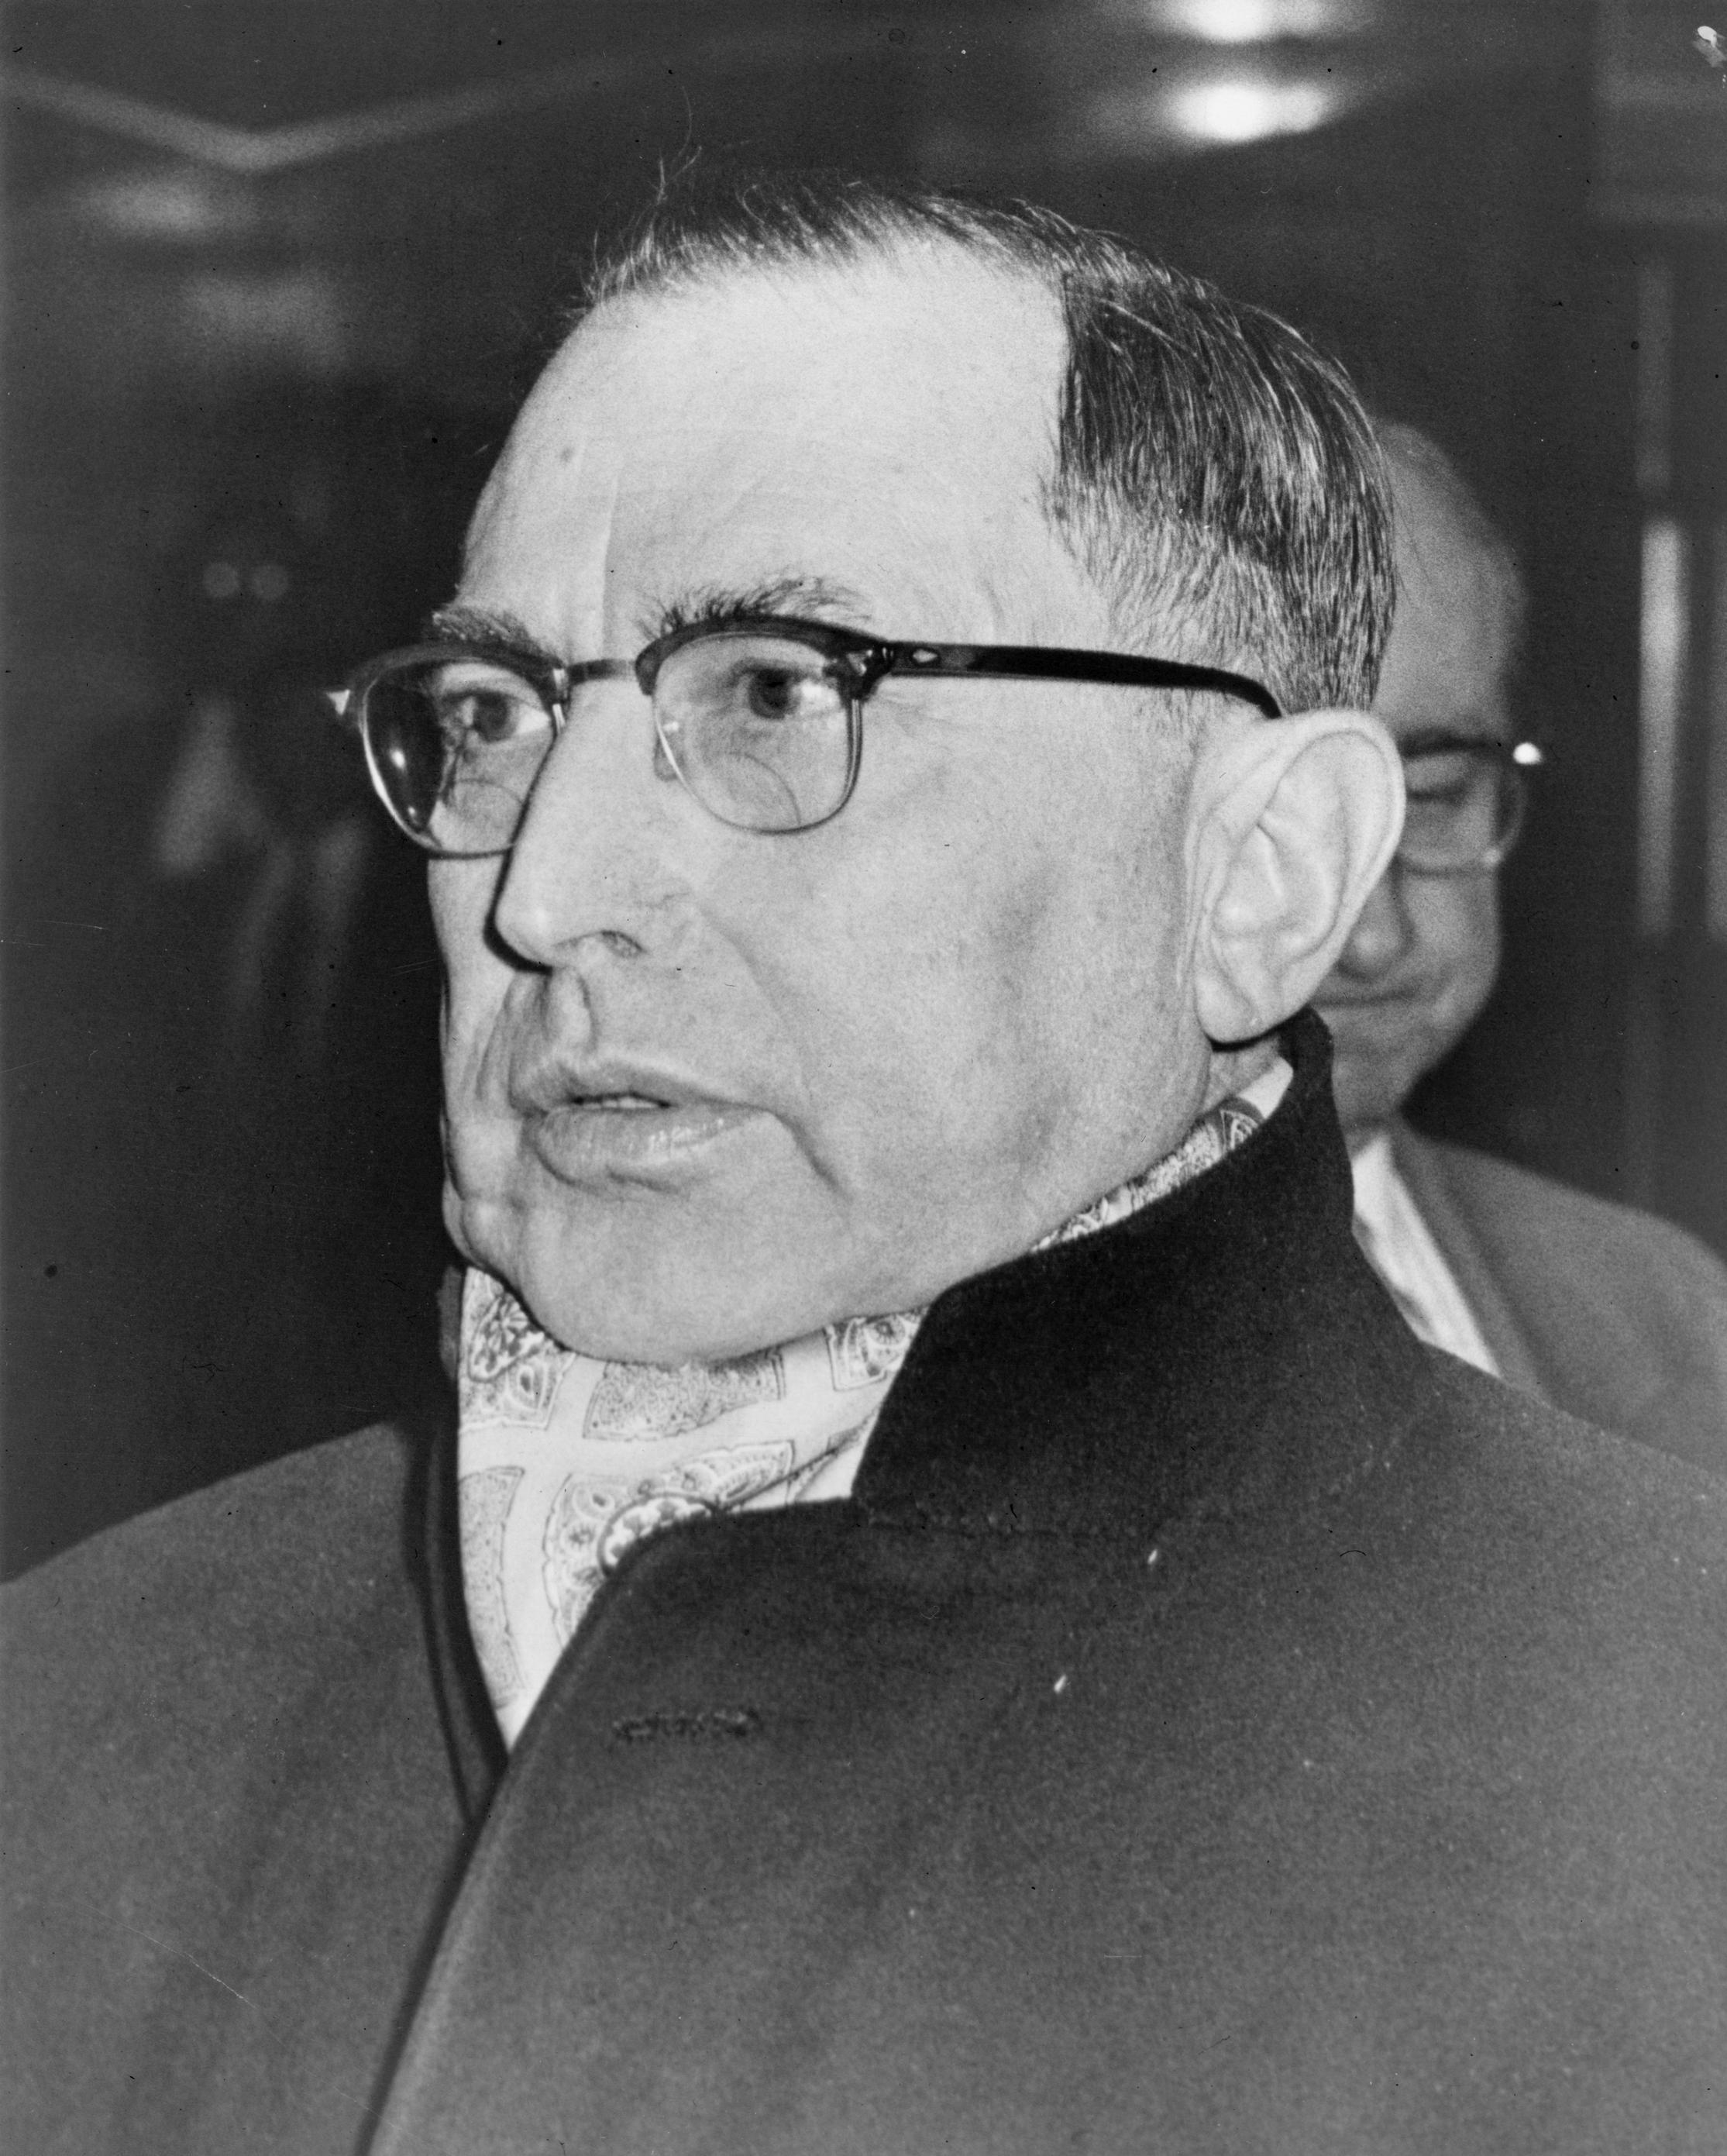 Joseph Profaci